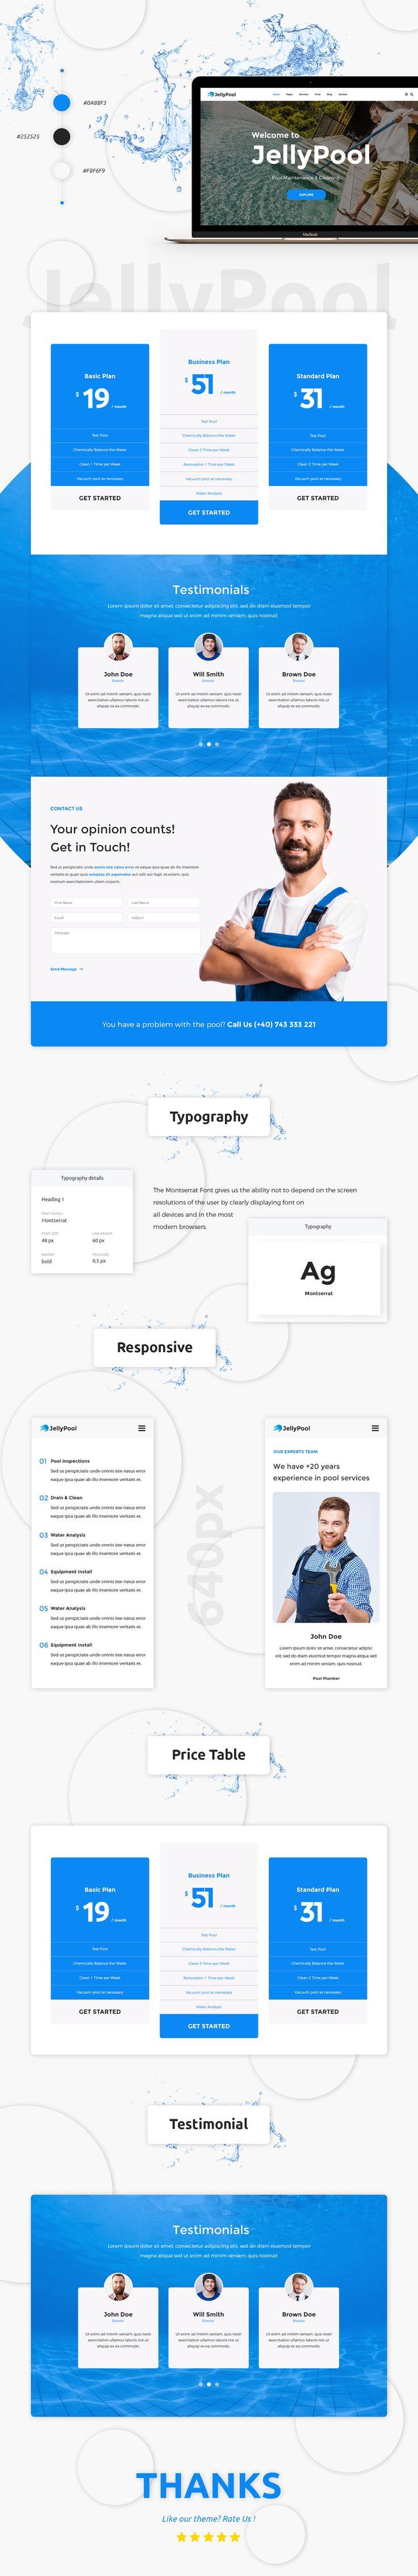 JellyPool - Pool Maintenance & Cleaning WordPress Theme by modeltheme